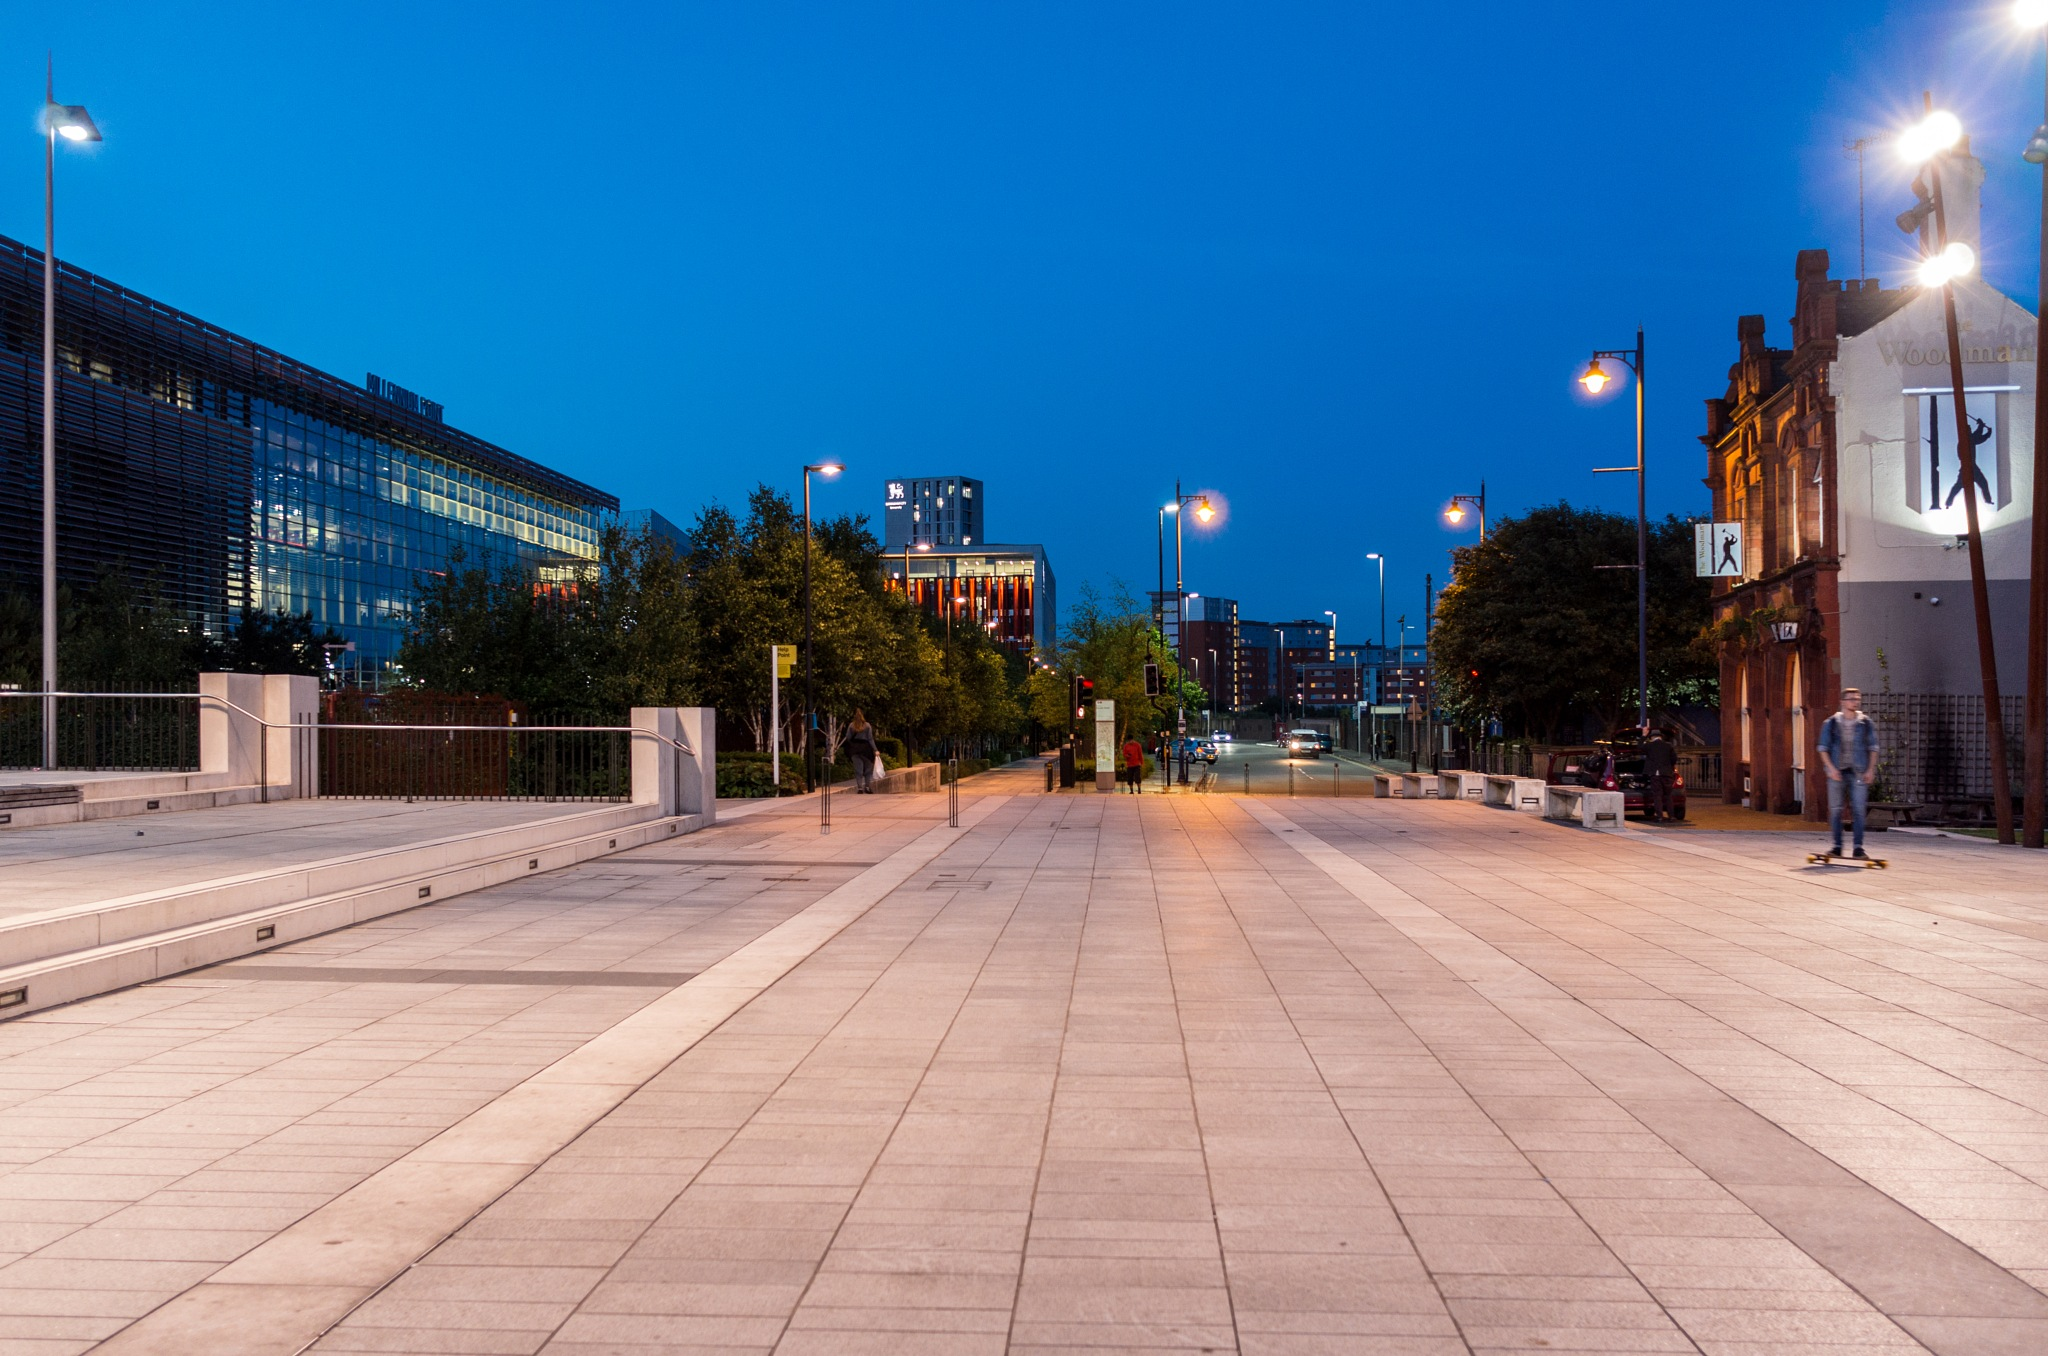 Millenium Point, Birmingham UK (at night) by john.coates.792